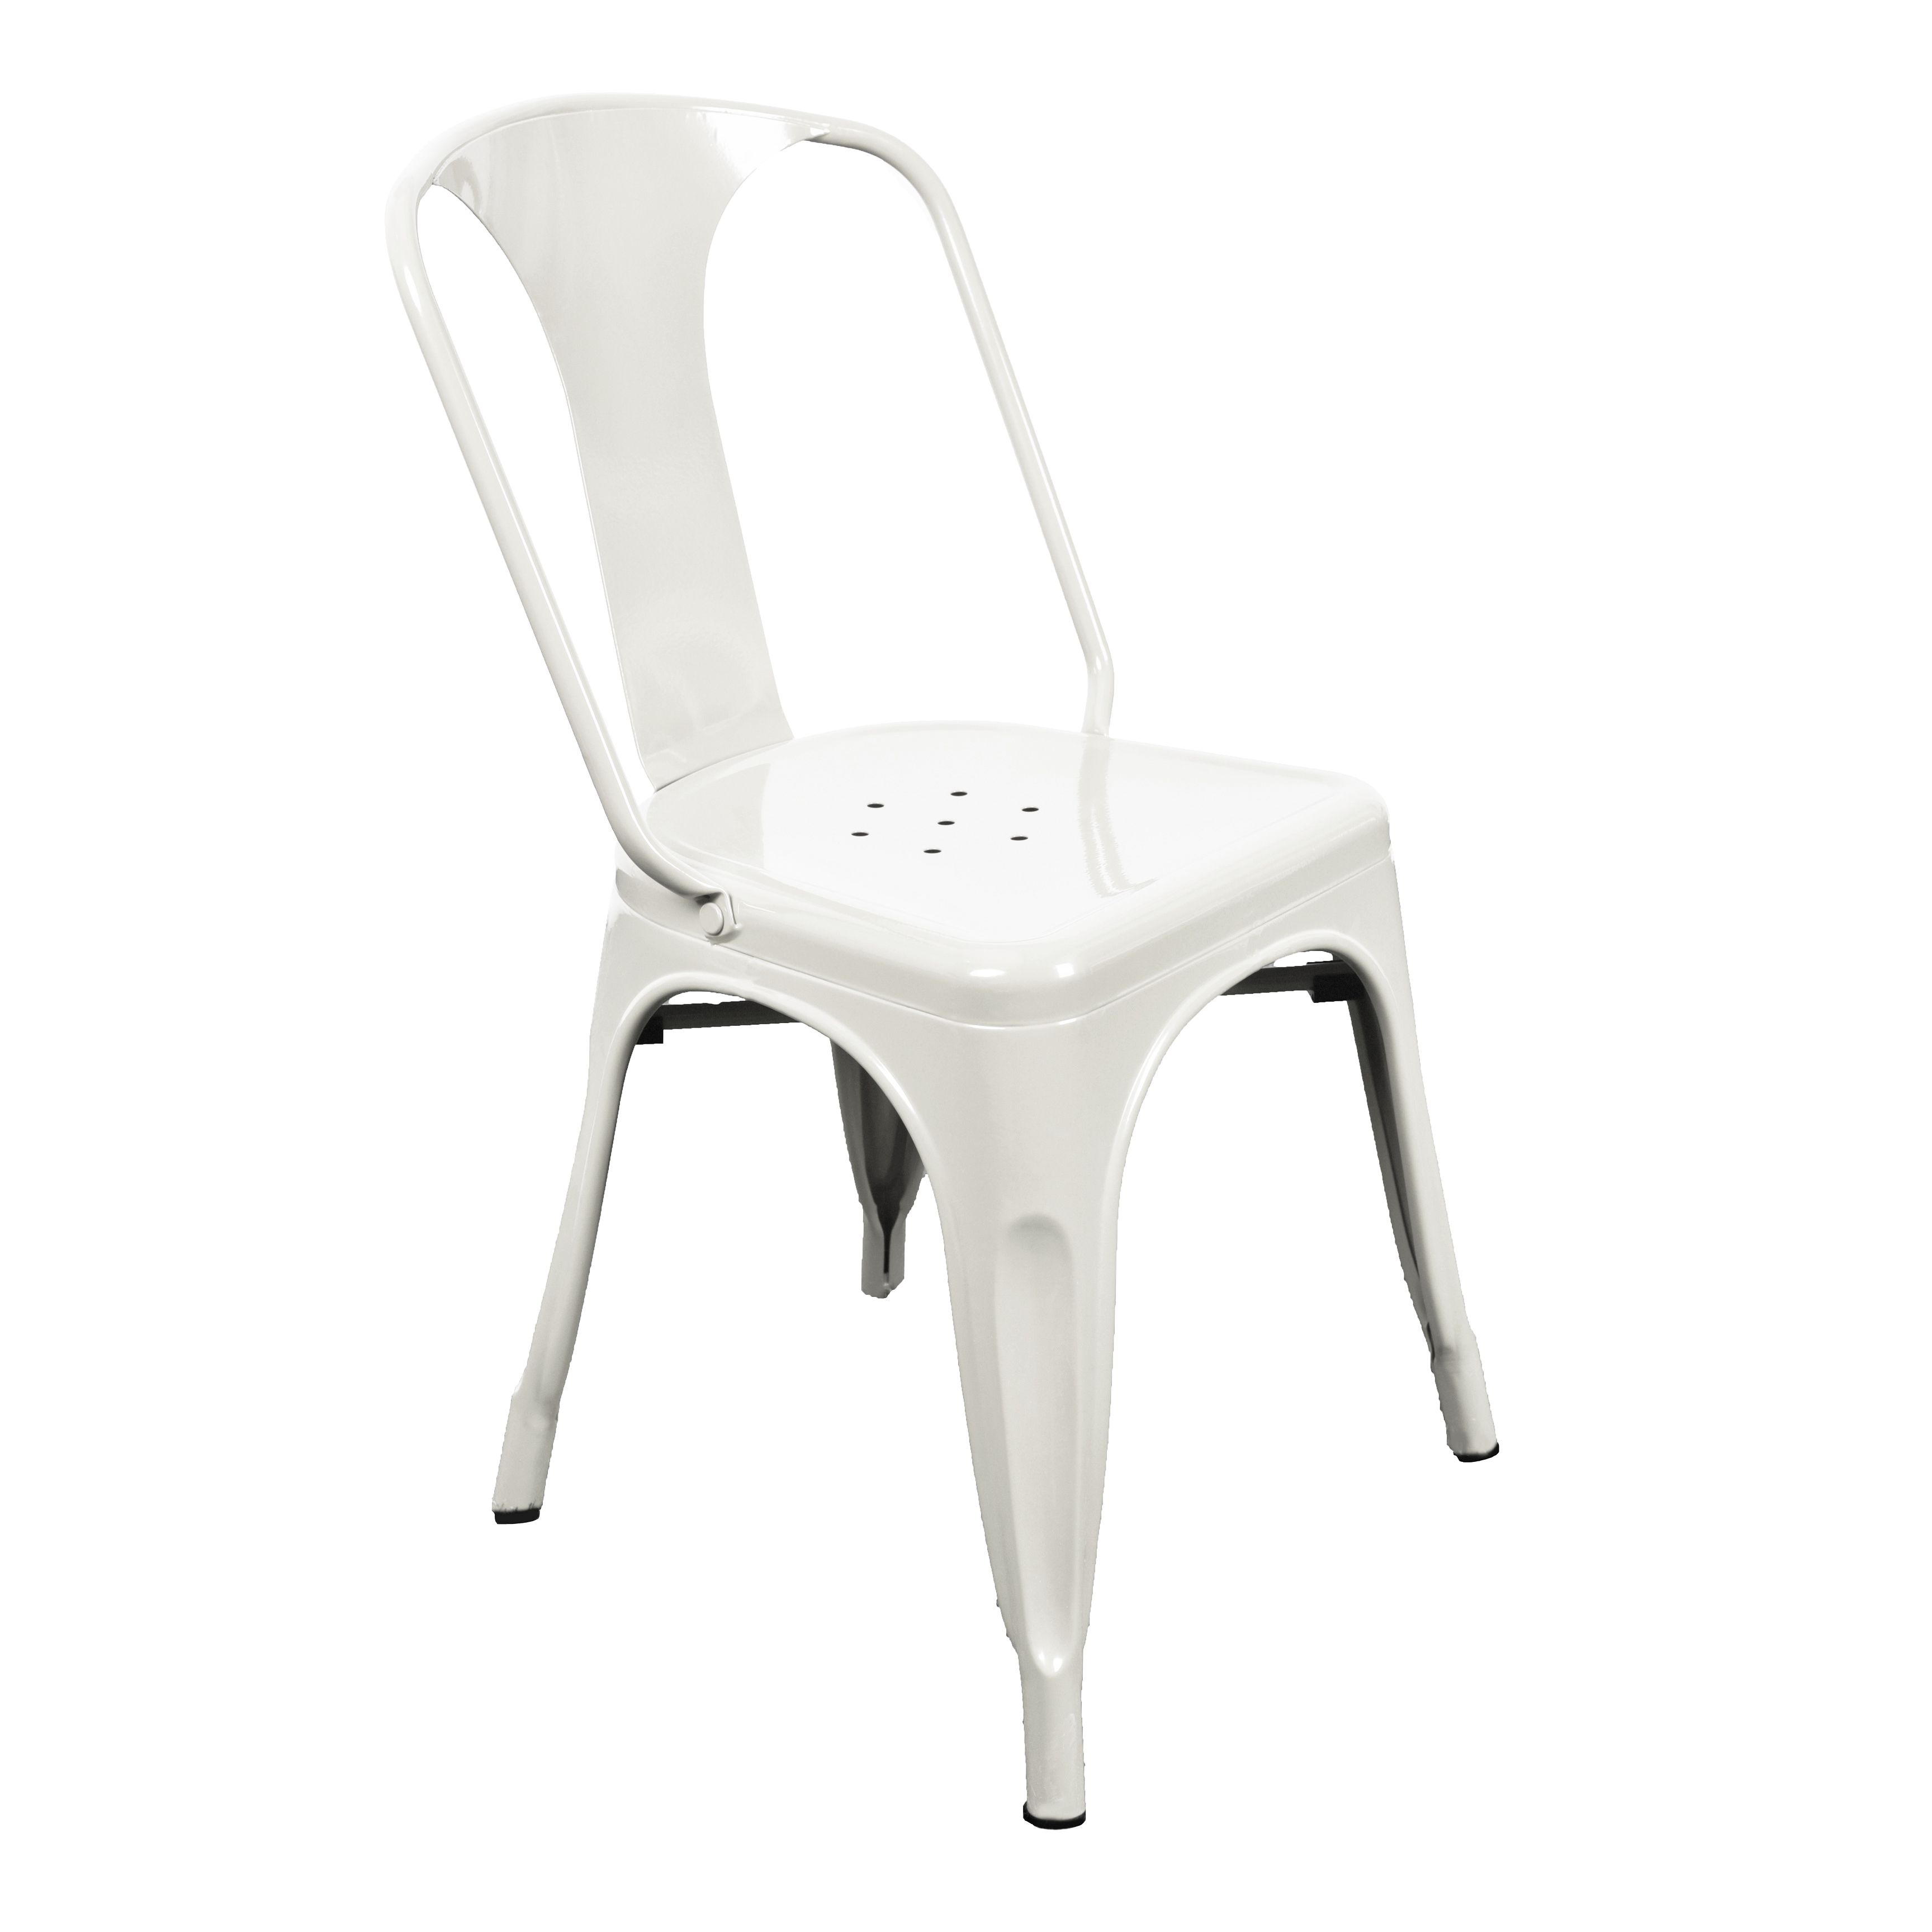 Porthos Home Joey Chair Set of 2 by Porthos Home